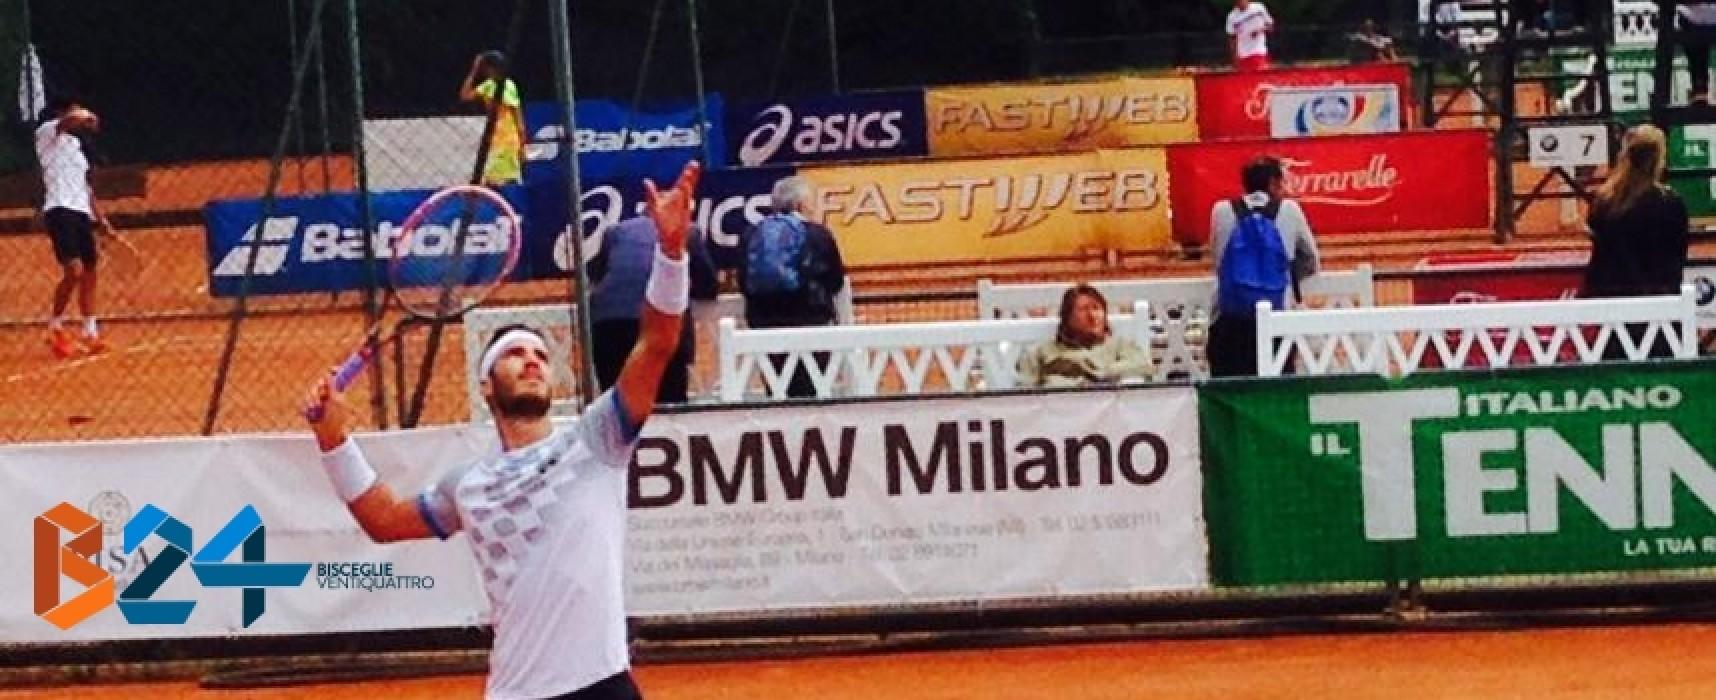 Tennis, Andrea Pellegrino ai quarti di finale del Memorial Fontana